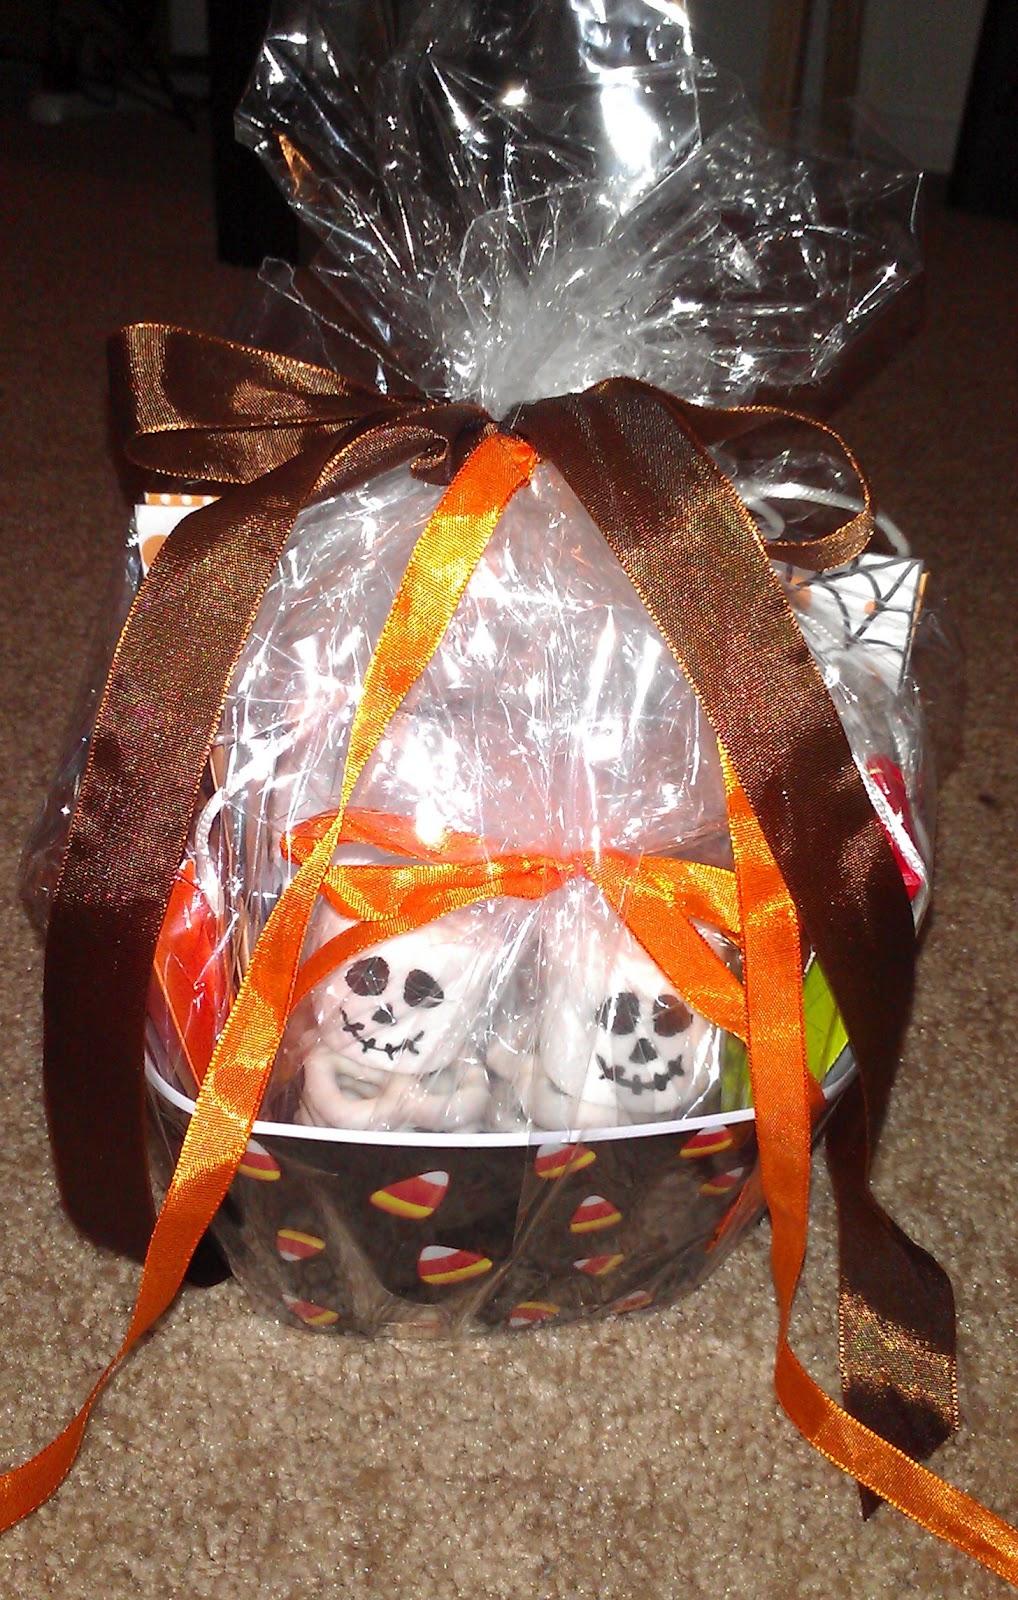 Apples to Applique: Halloween Goodie Basket